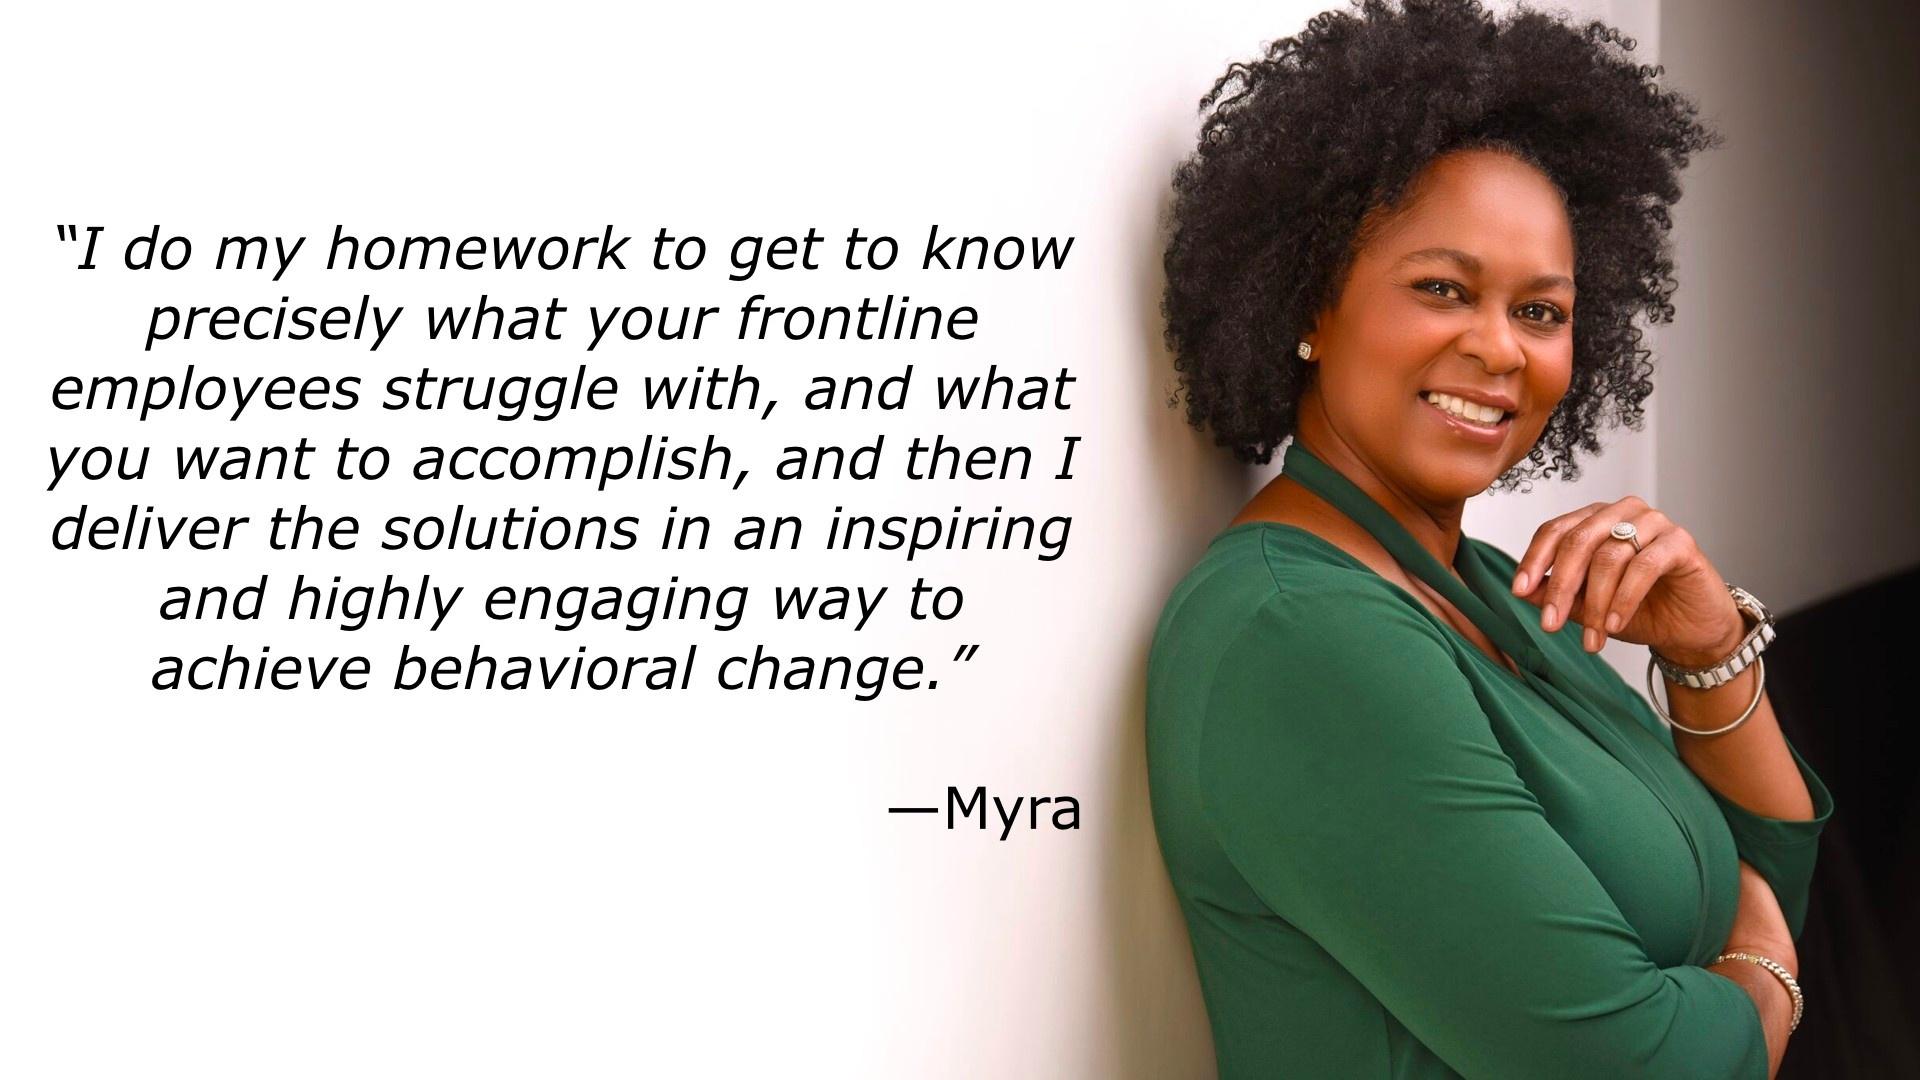 Myra against white background